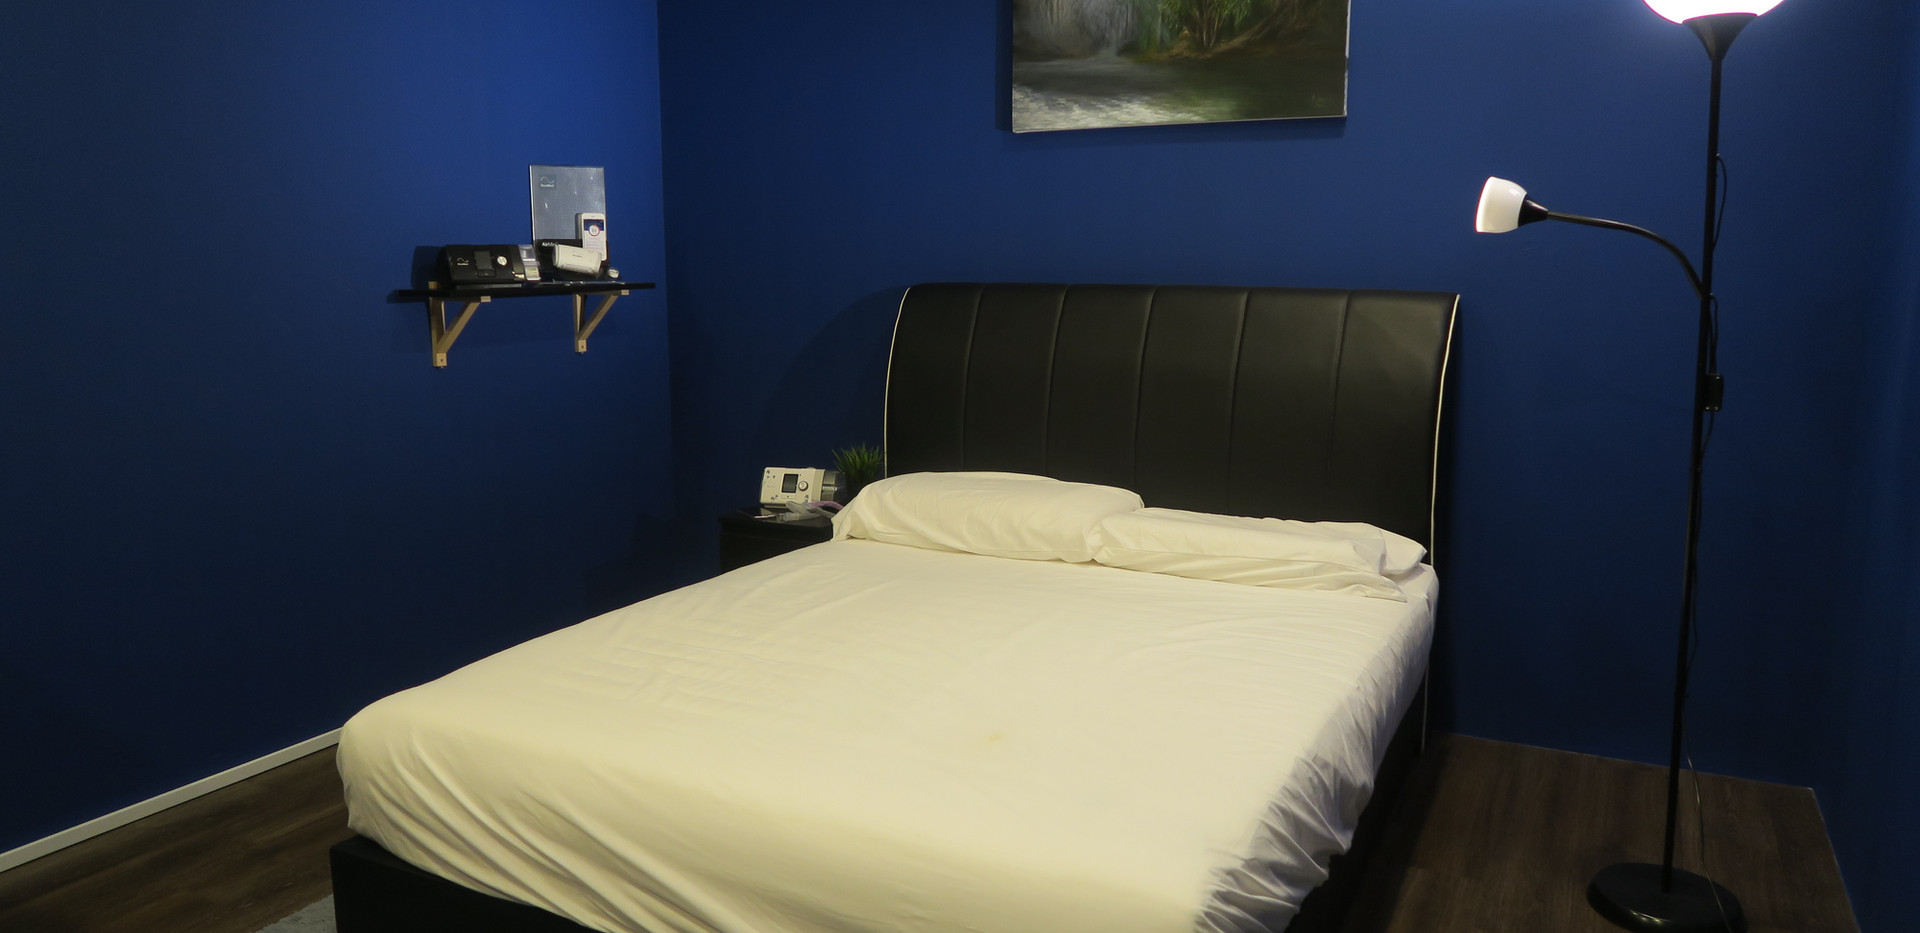 The Air Station Sleep Experience Room